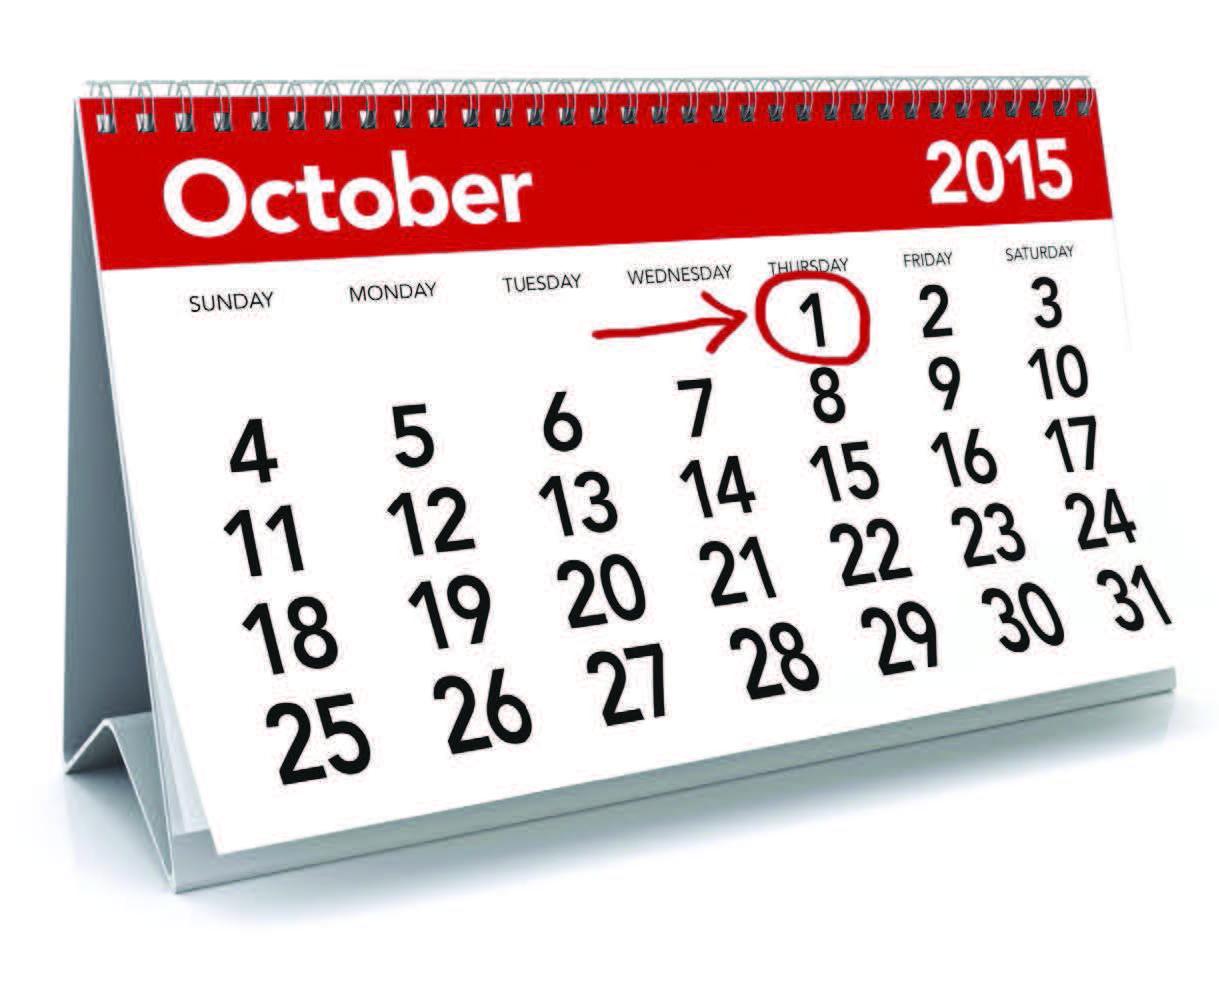 Calendar with october 1st circled